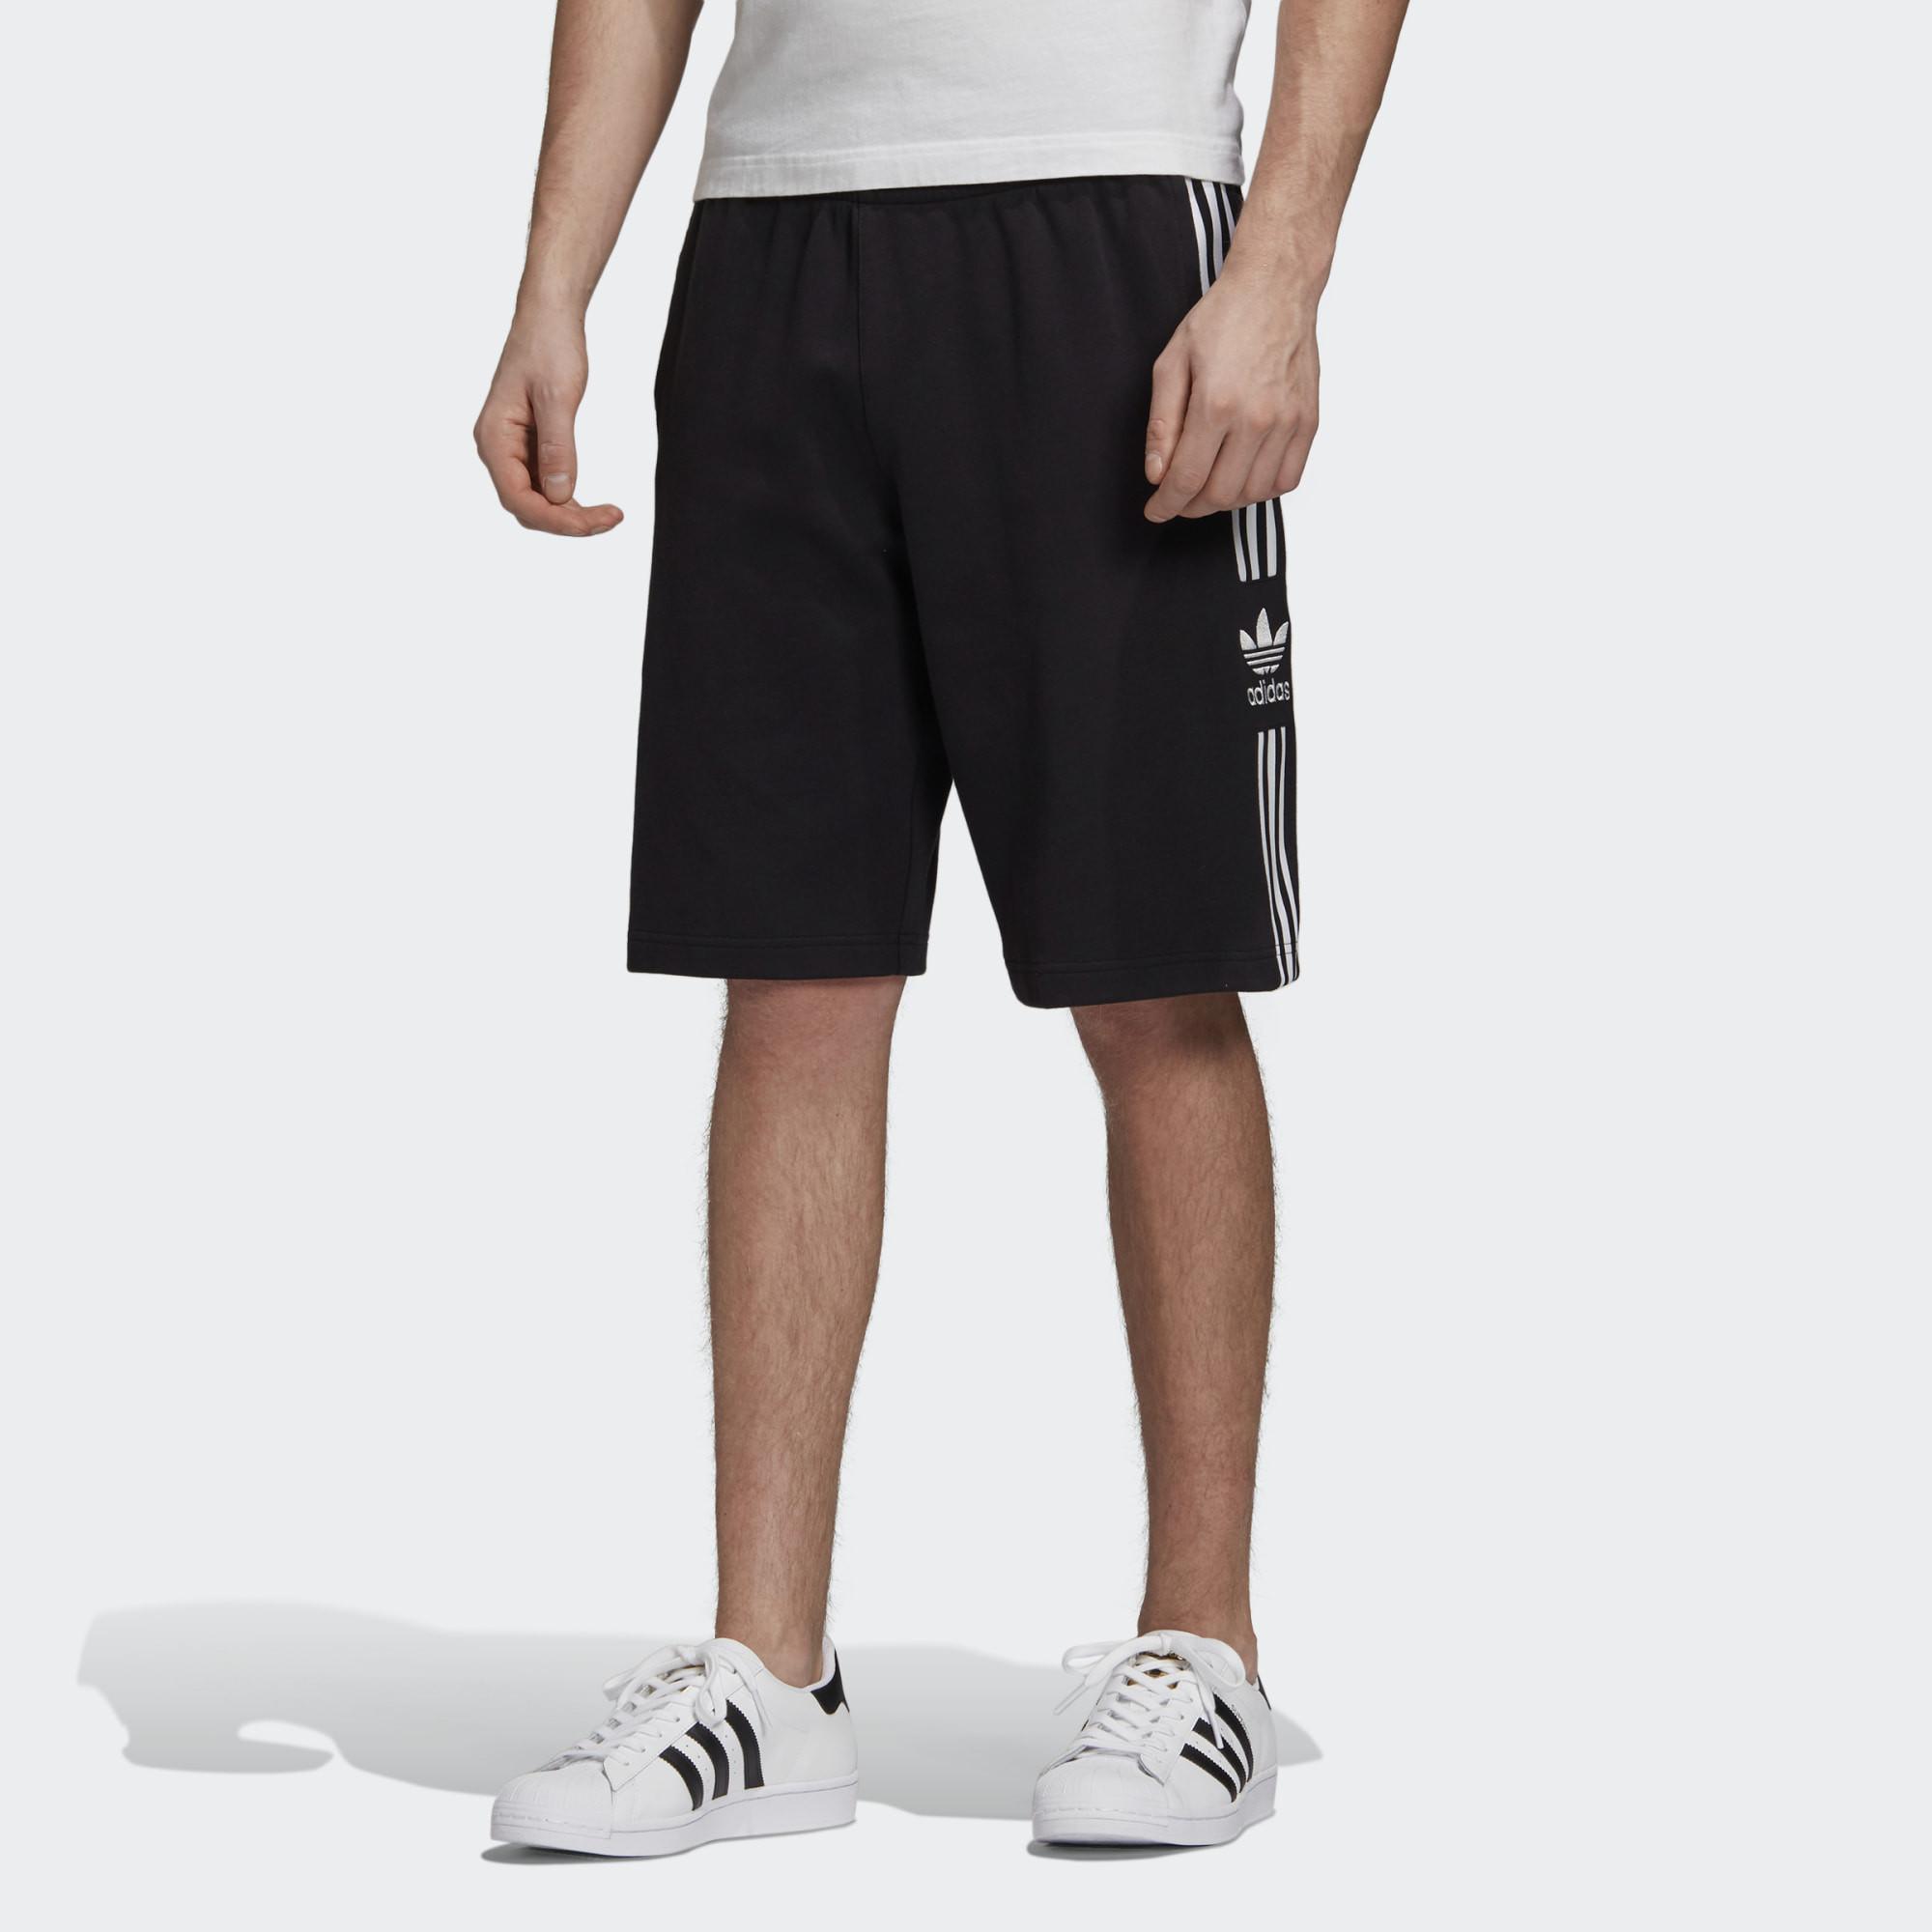 adidas Originals Lockup Men's Shorts (9000045725_1469)